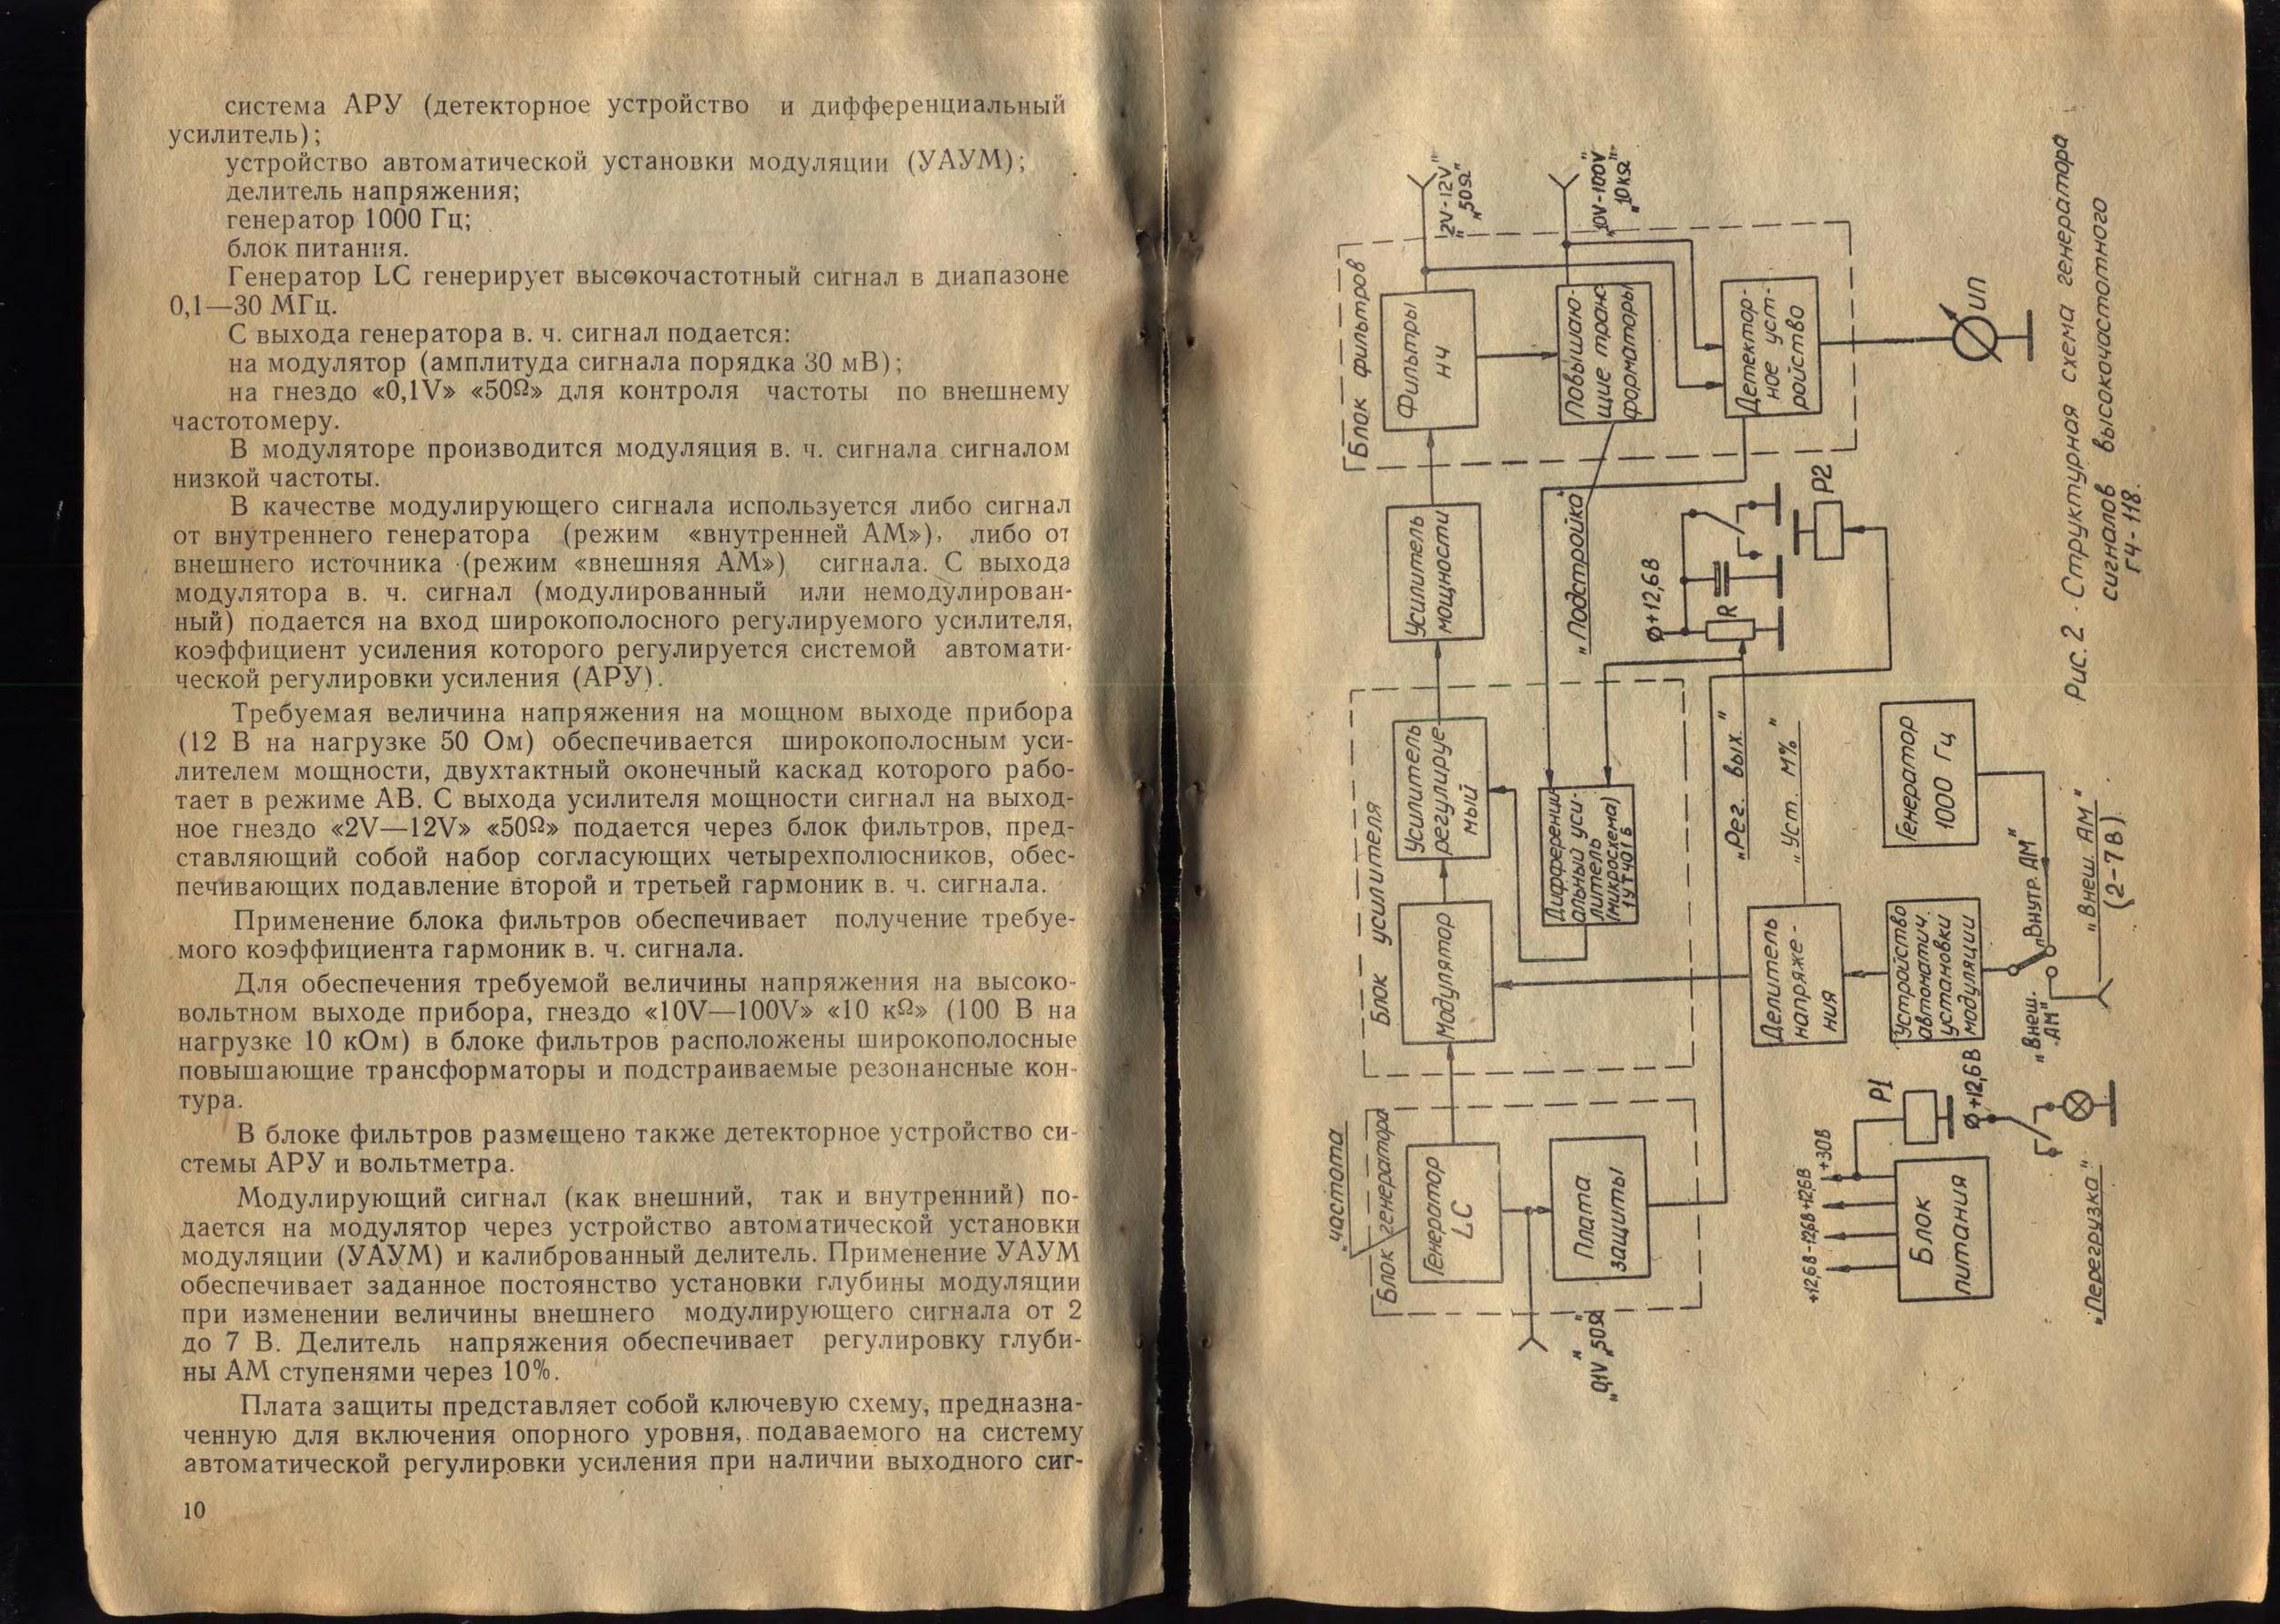 Вольтметр ф4830 схема